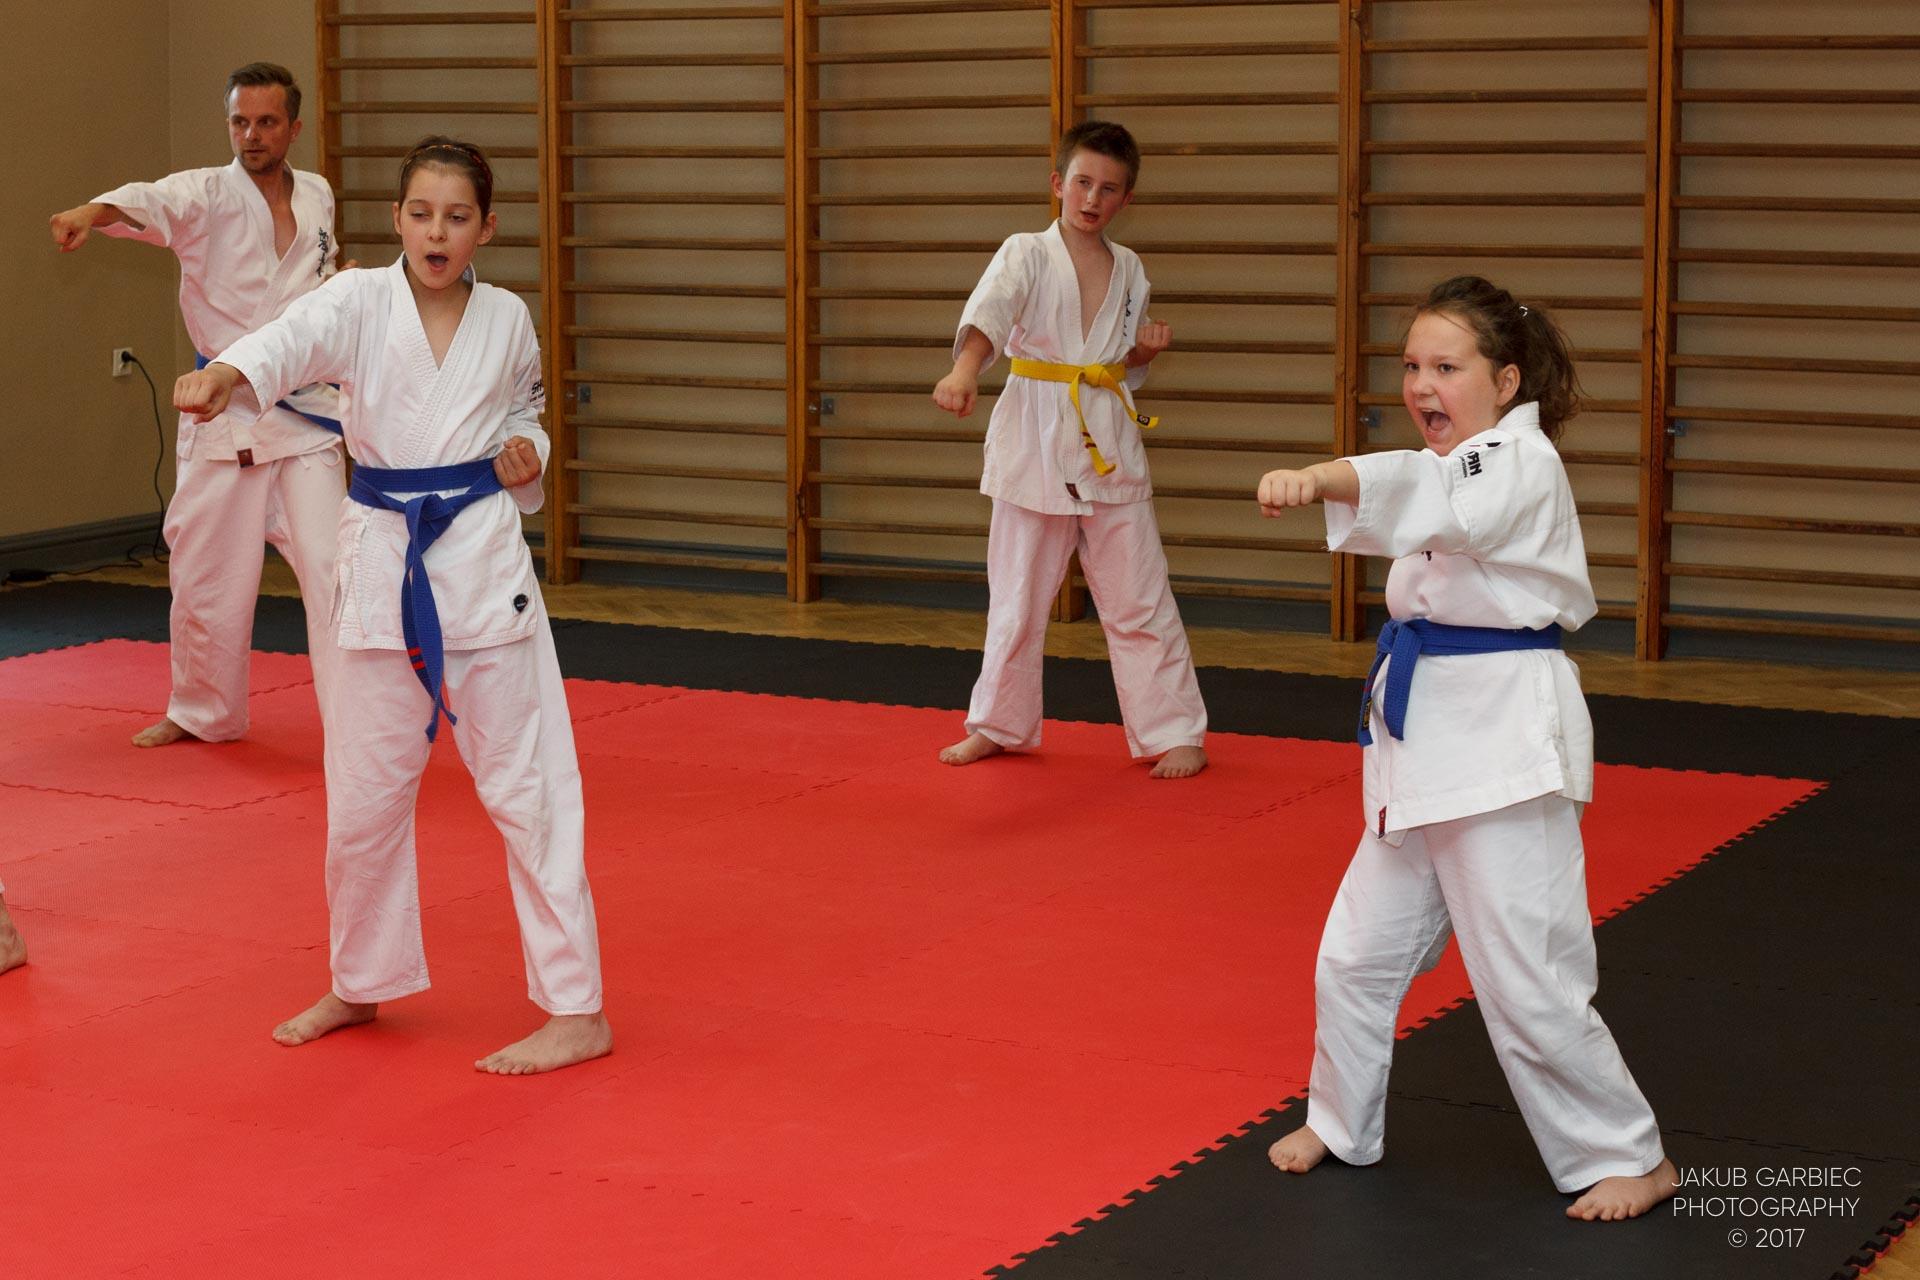 egzamin-karate-mistrz-mariusz-mazur-klub-karate-shodan-2017-06-02-13